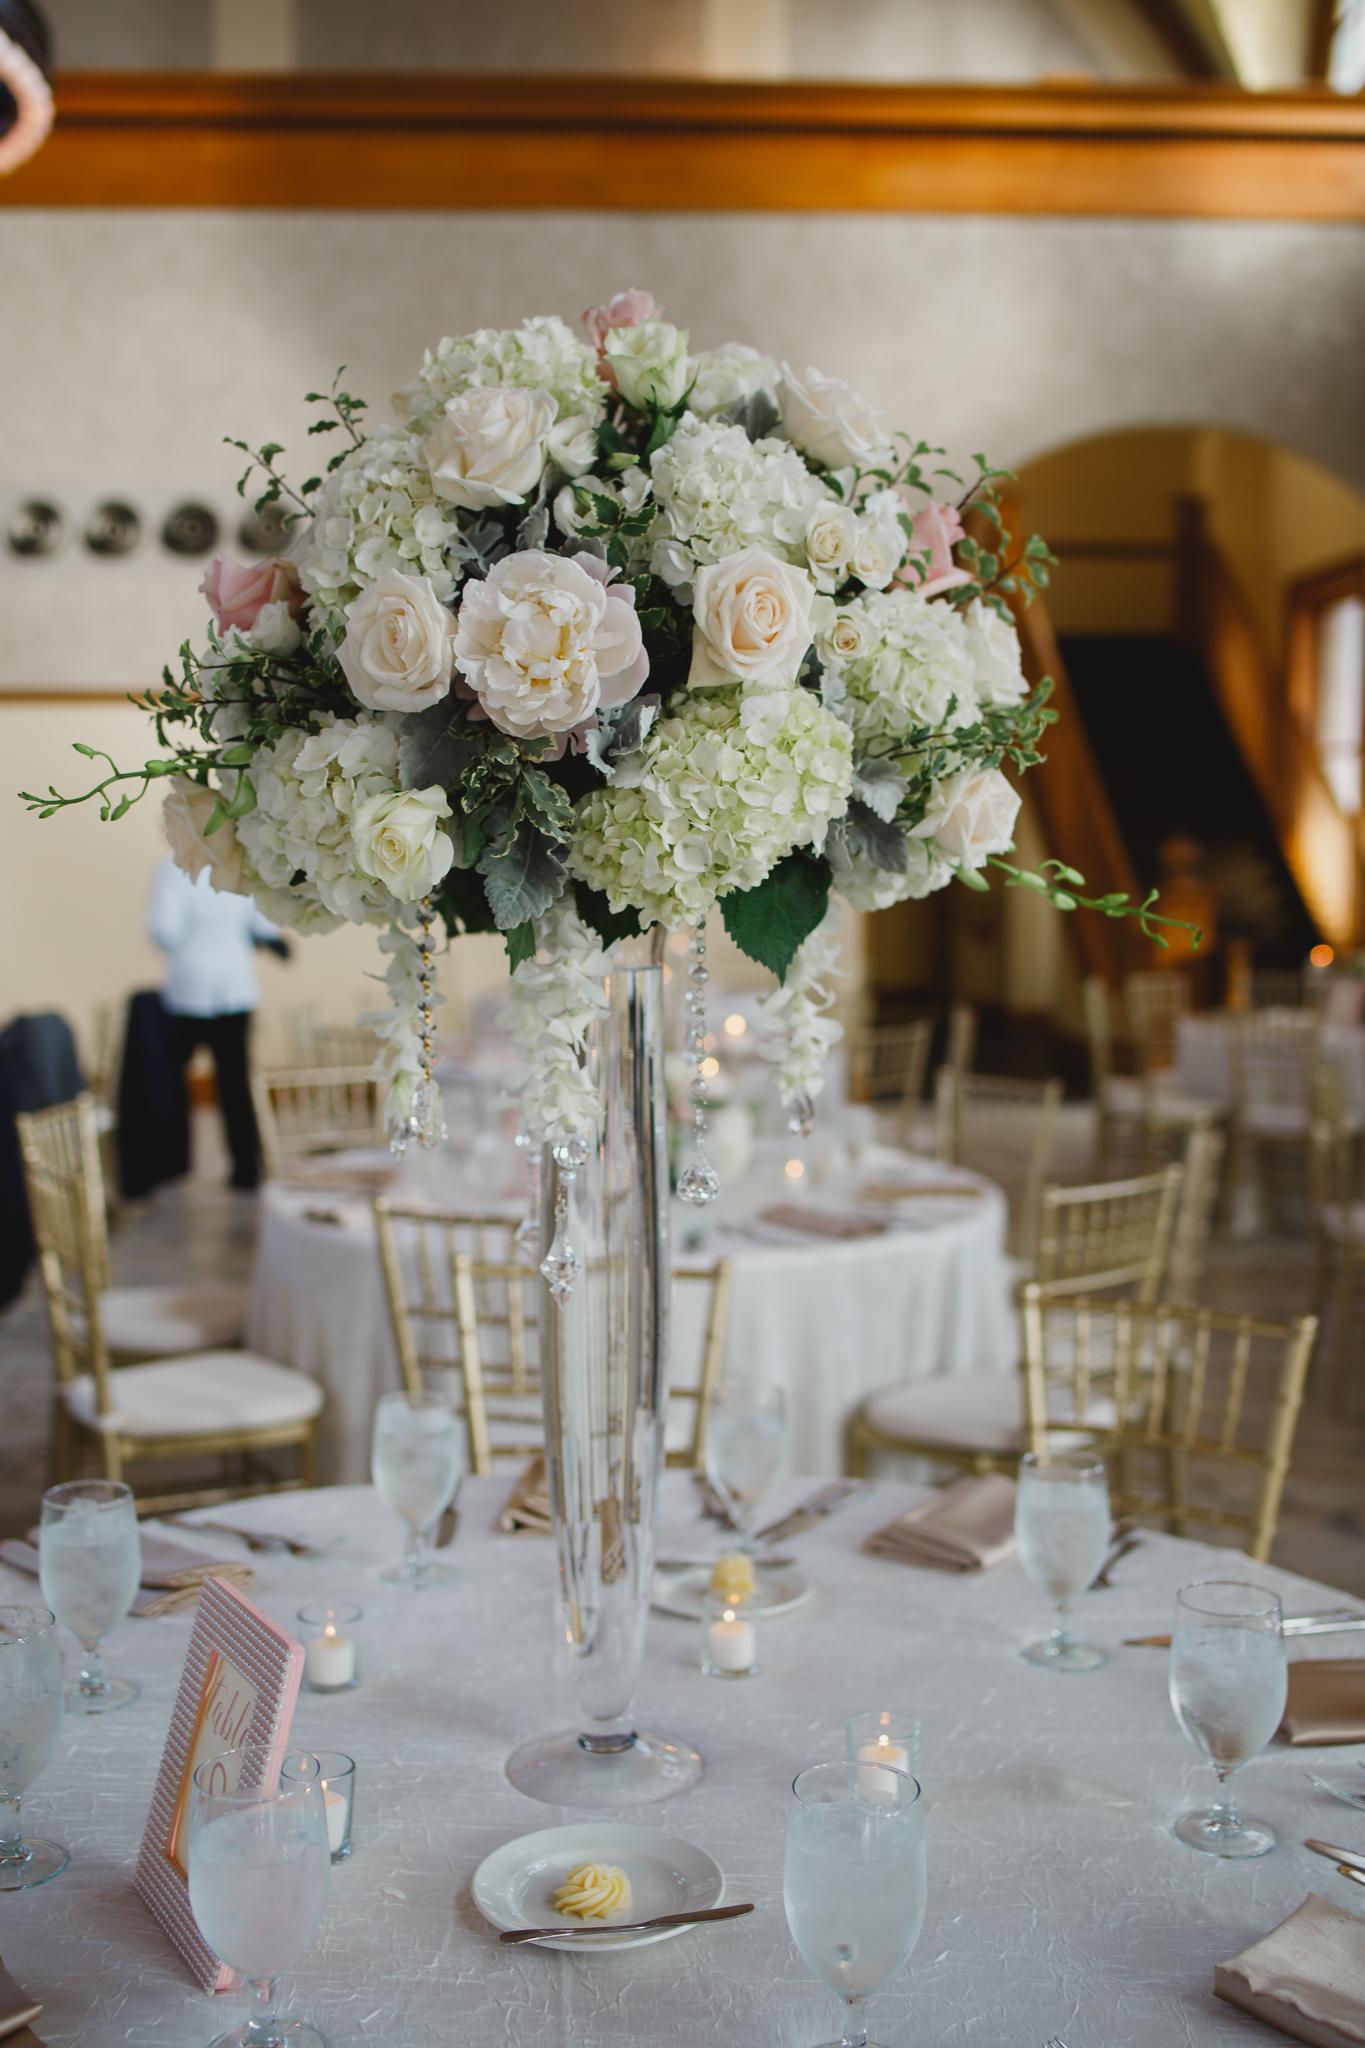 Michael and Kelly - the ashton depot - wedding DFW - wedding photographer- elizalde photography (81 of 150).jpg